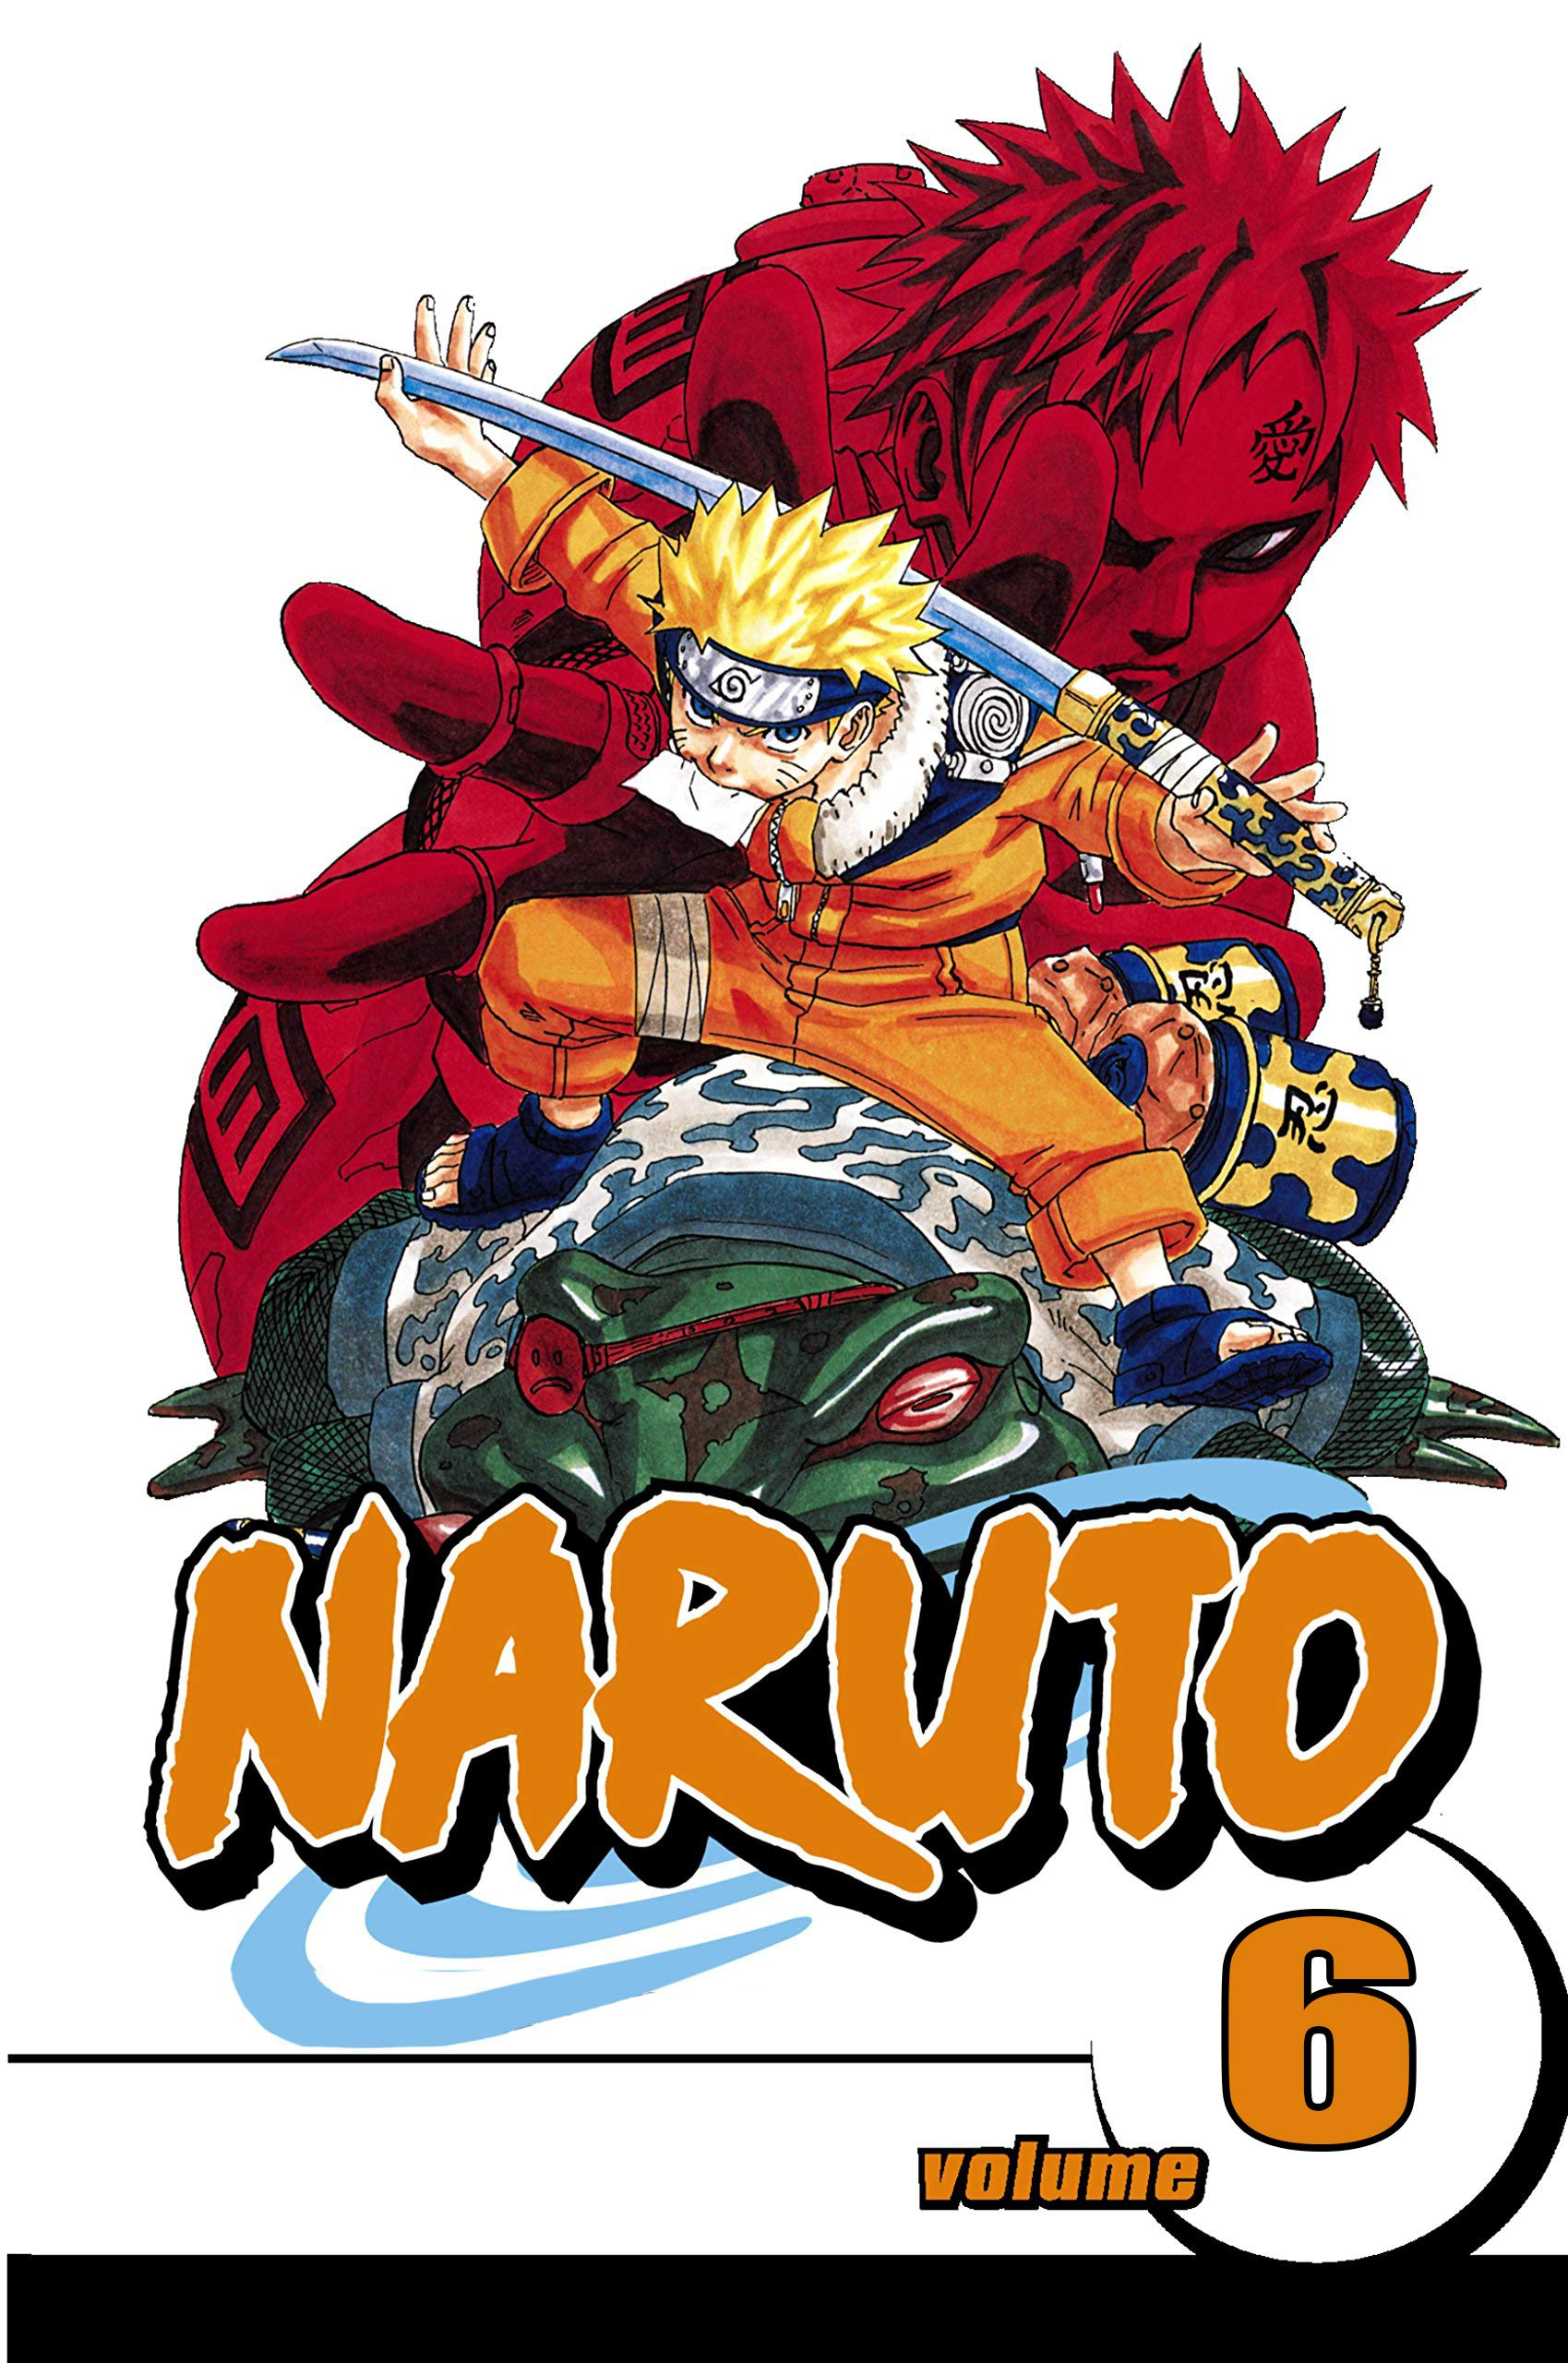 Naruto Full Color: Manga volume 6